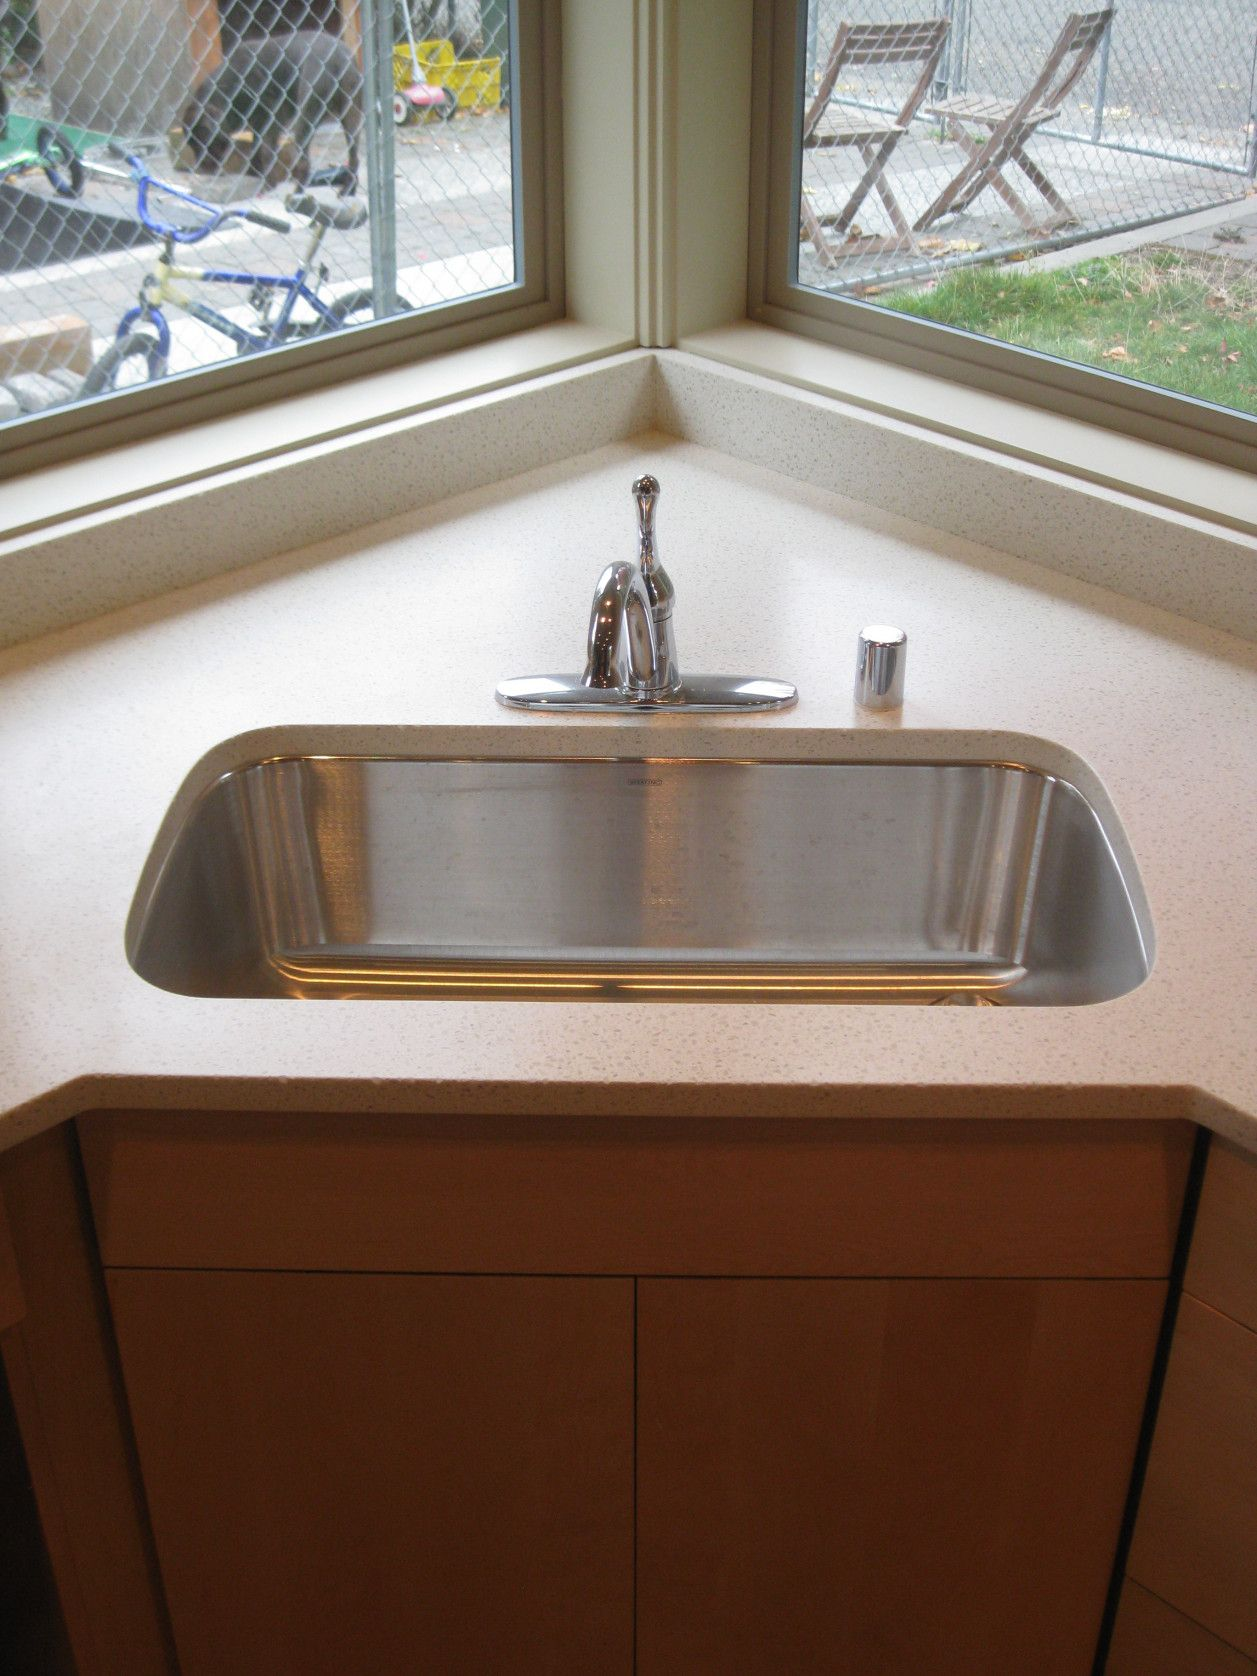 Pin By Rahayu12 On Interior Analogi Single Sink Kitchen Corner Sink Kitchen Kitchen Sink Design